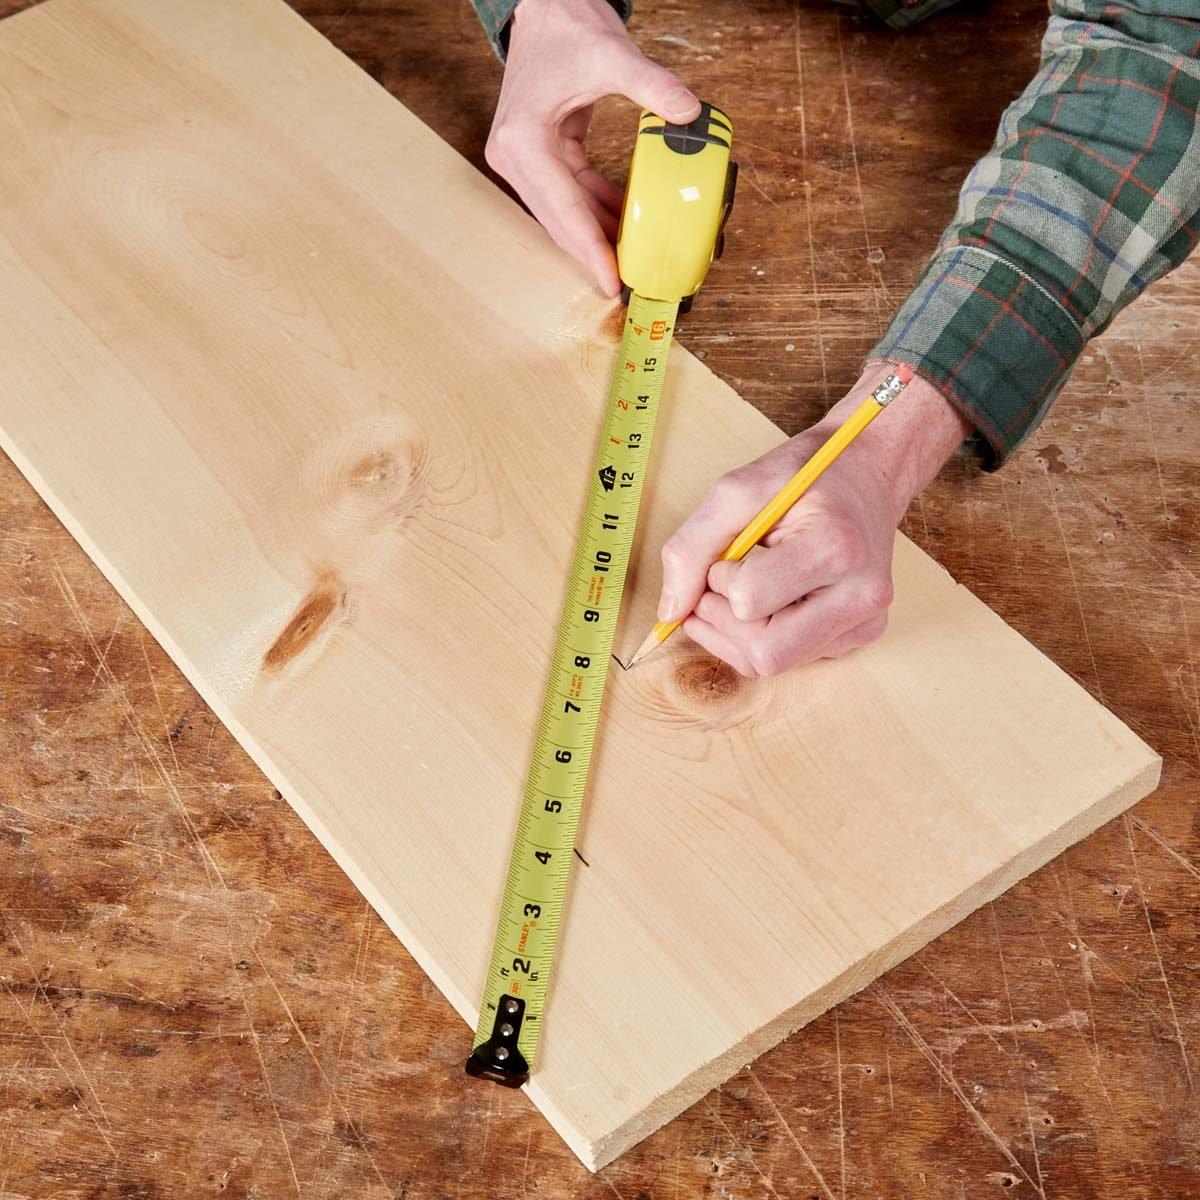 odd width measuring